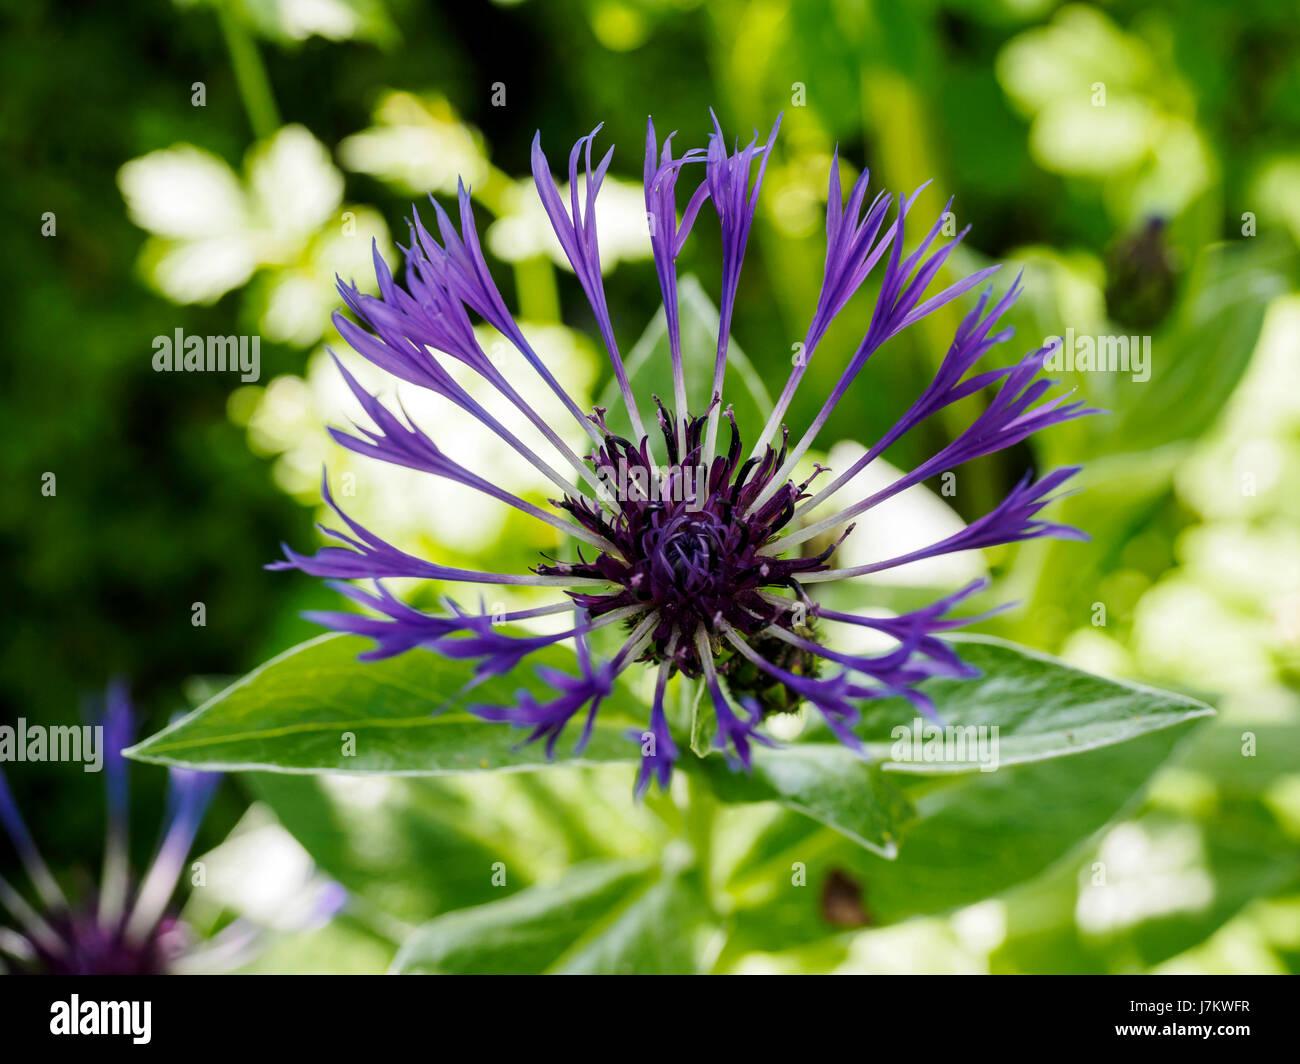 Beautiful Star Shaped Purple Flower Of The Perennial Cornflower Or